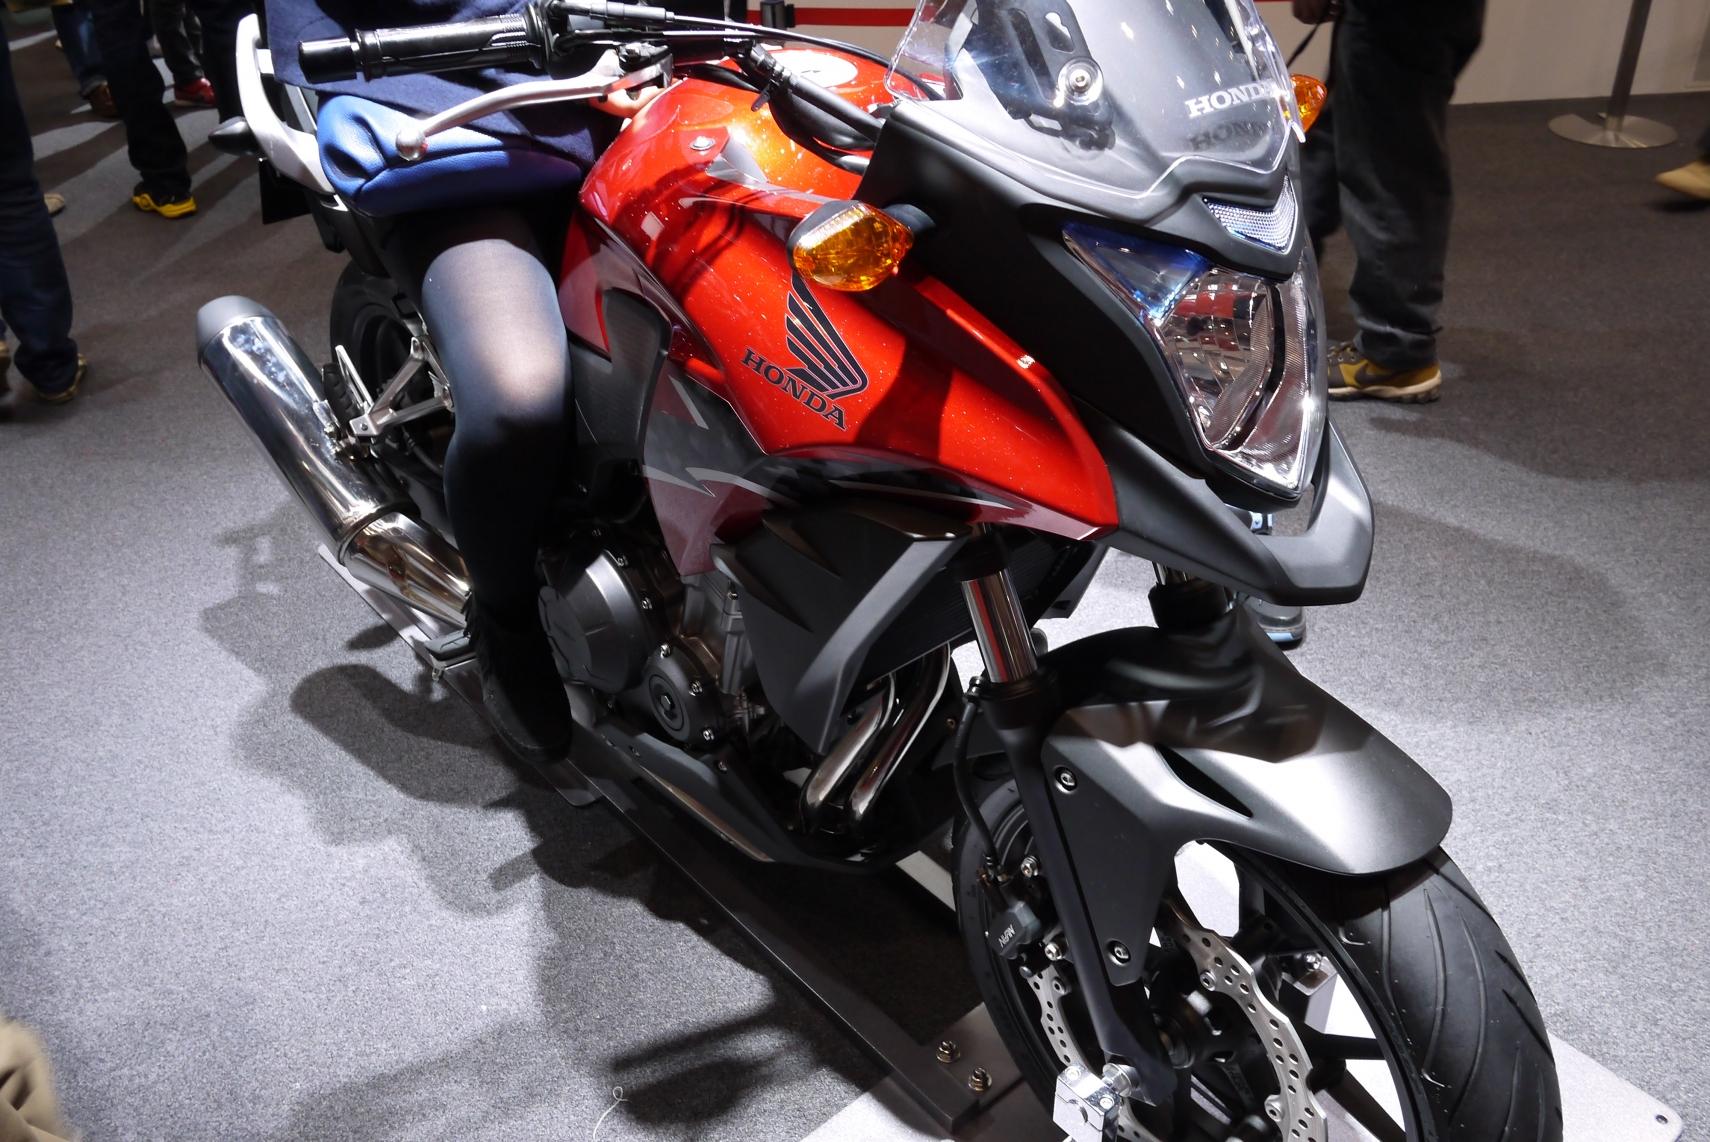 HONDAの赤いカウルのバイクと女性の脚